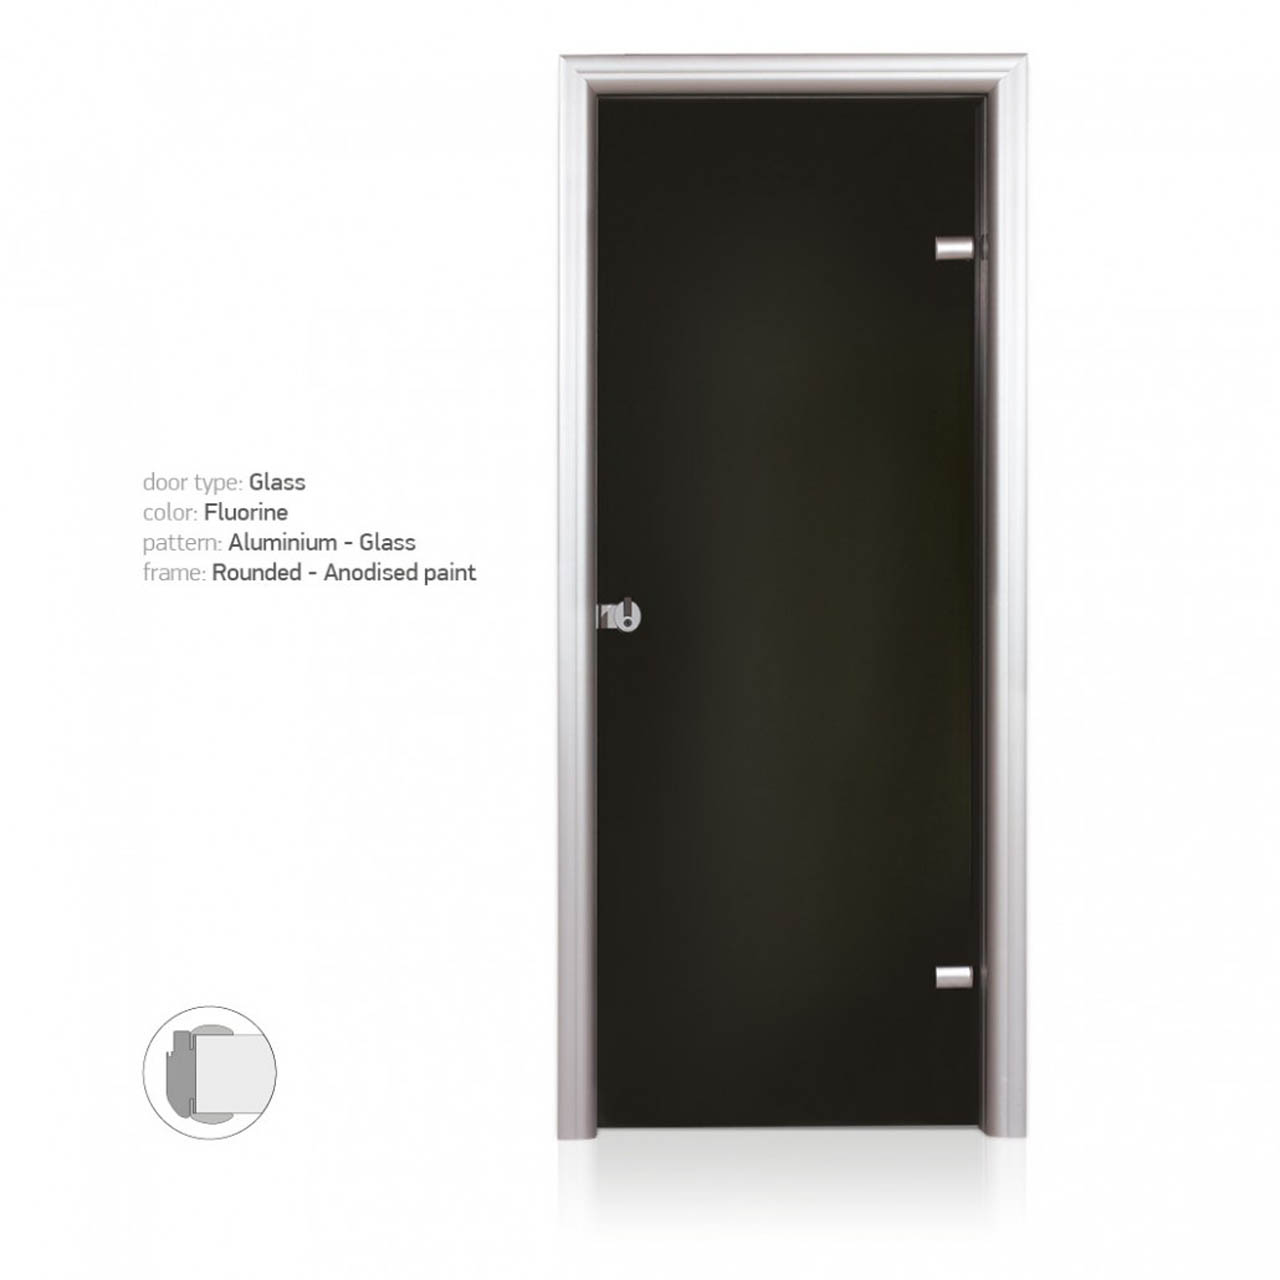 portes-site-glass-eng3-1030x1030 (1)